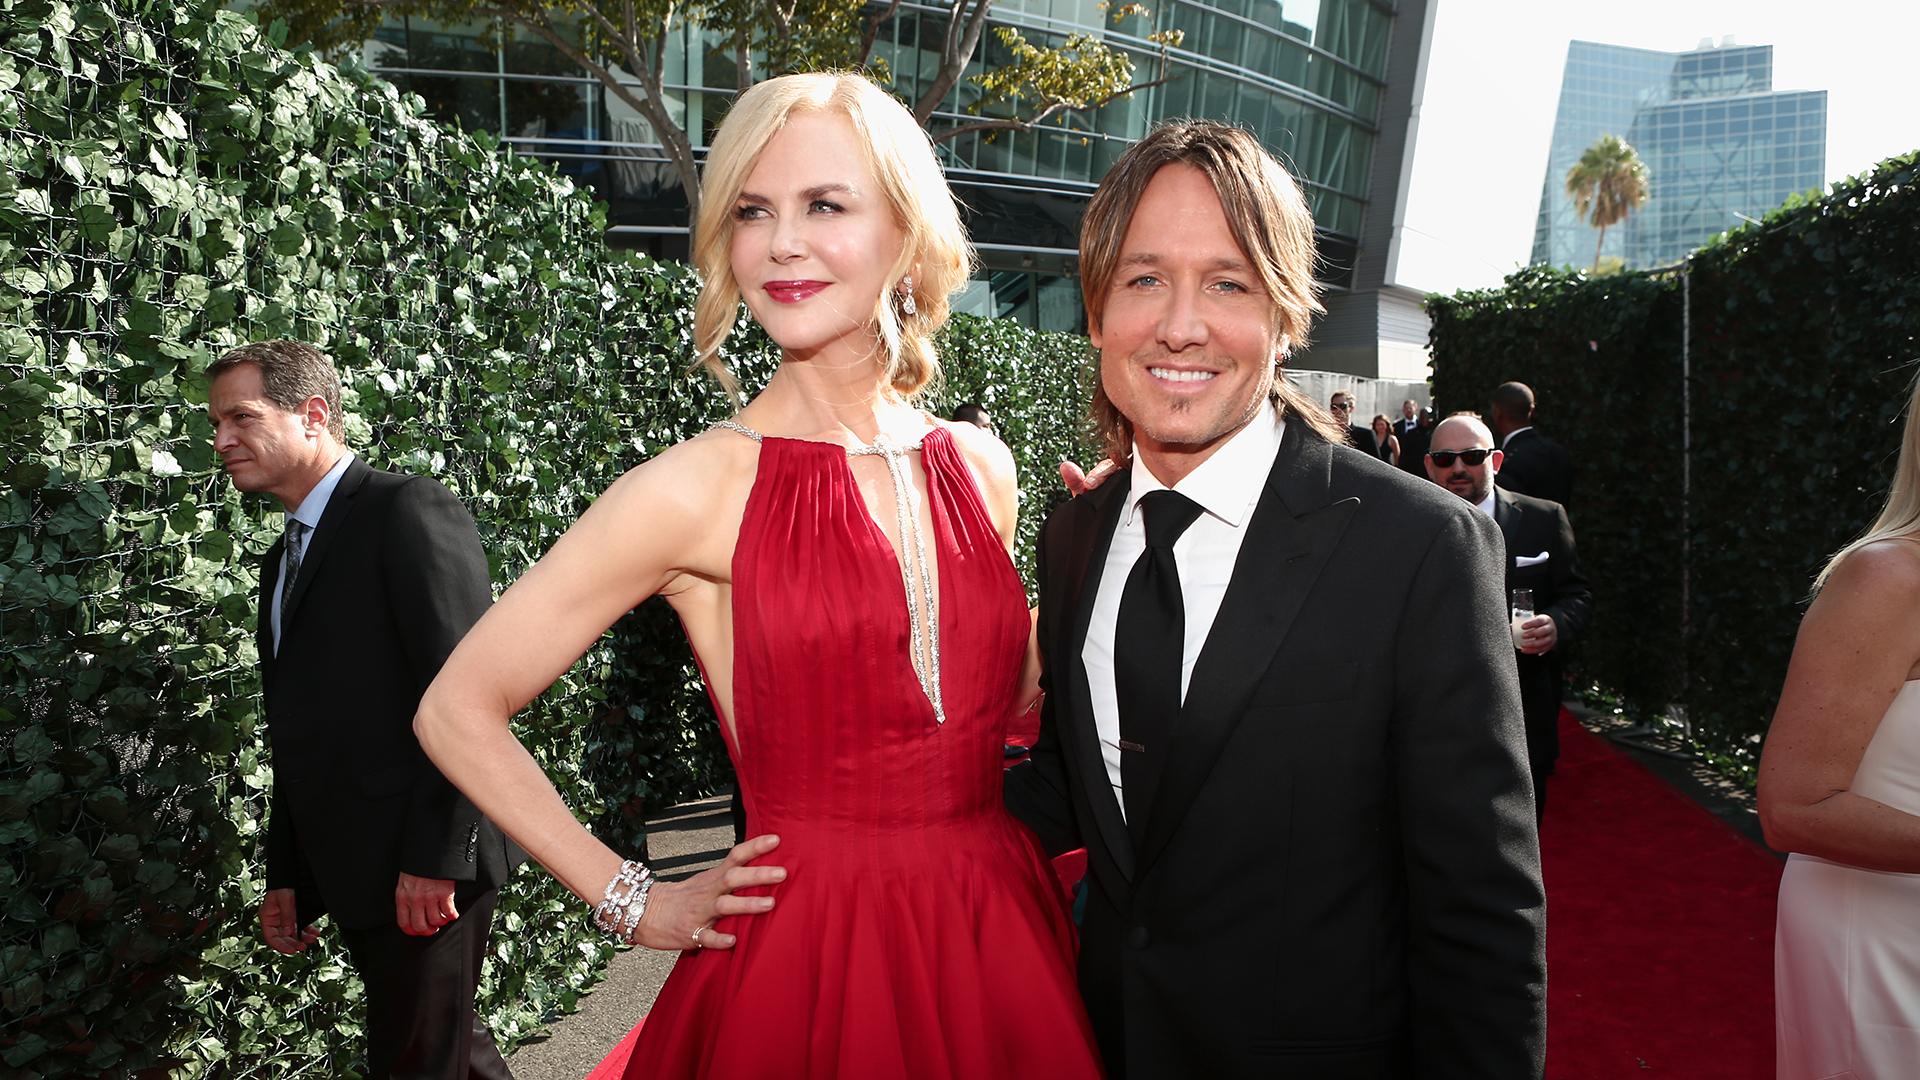 Nicole Kidman from Big Little Lies and husband Keith Urban